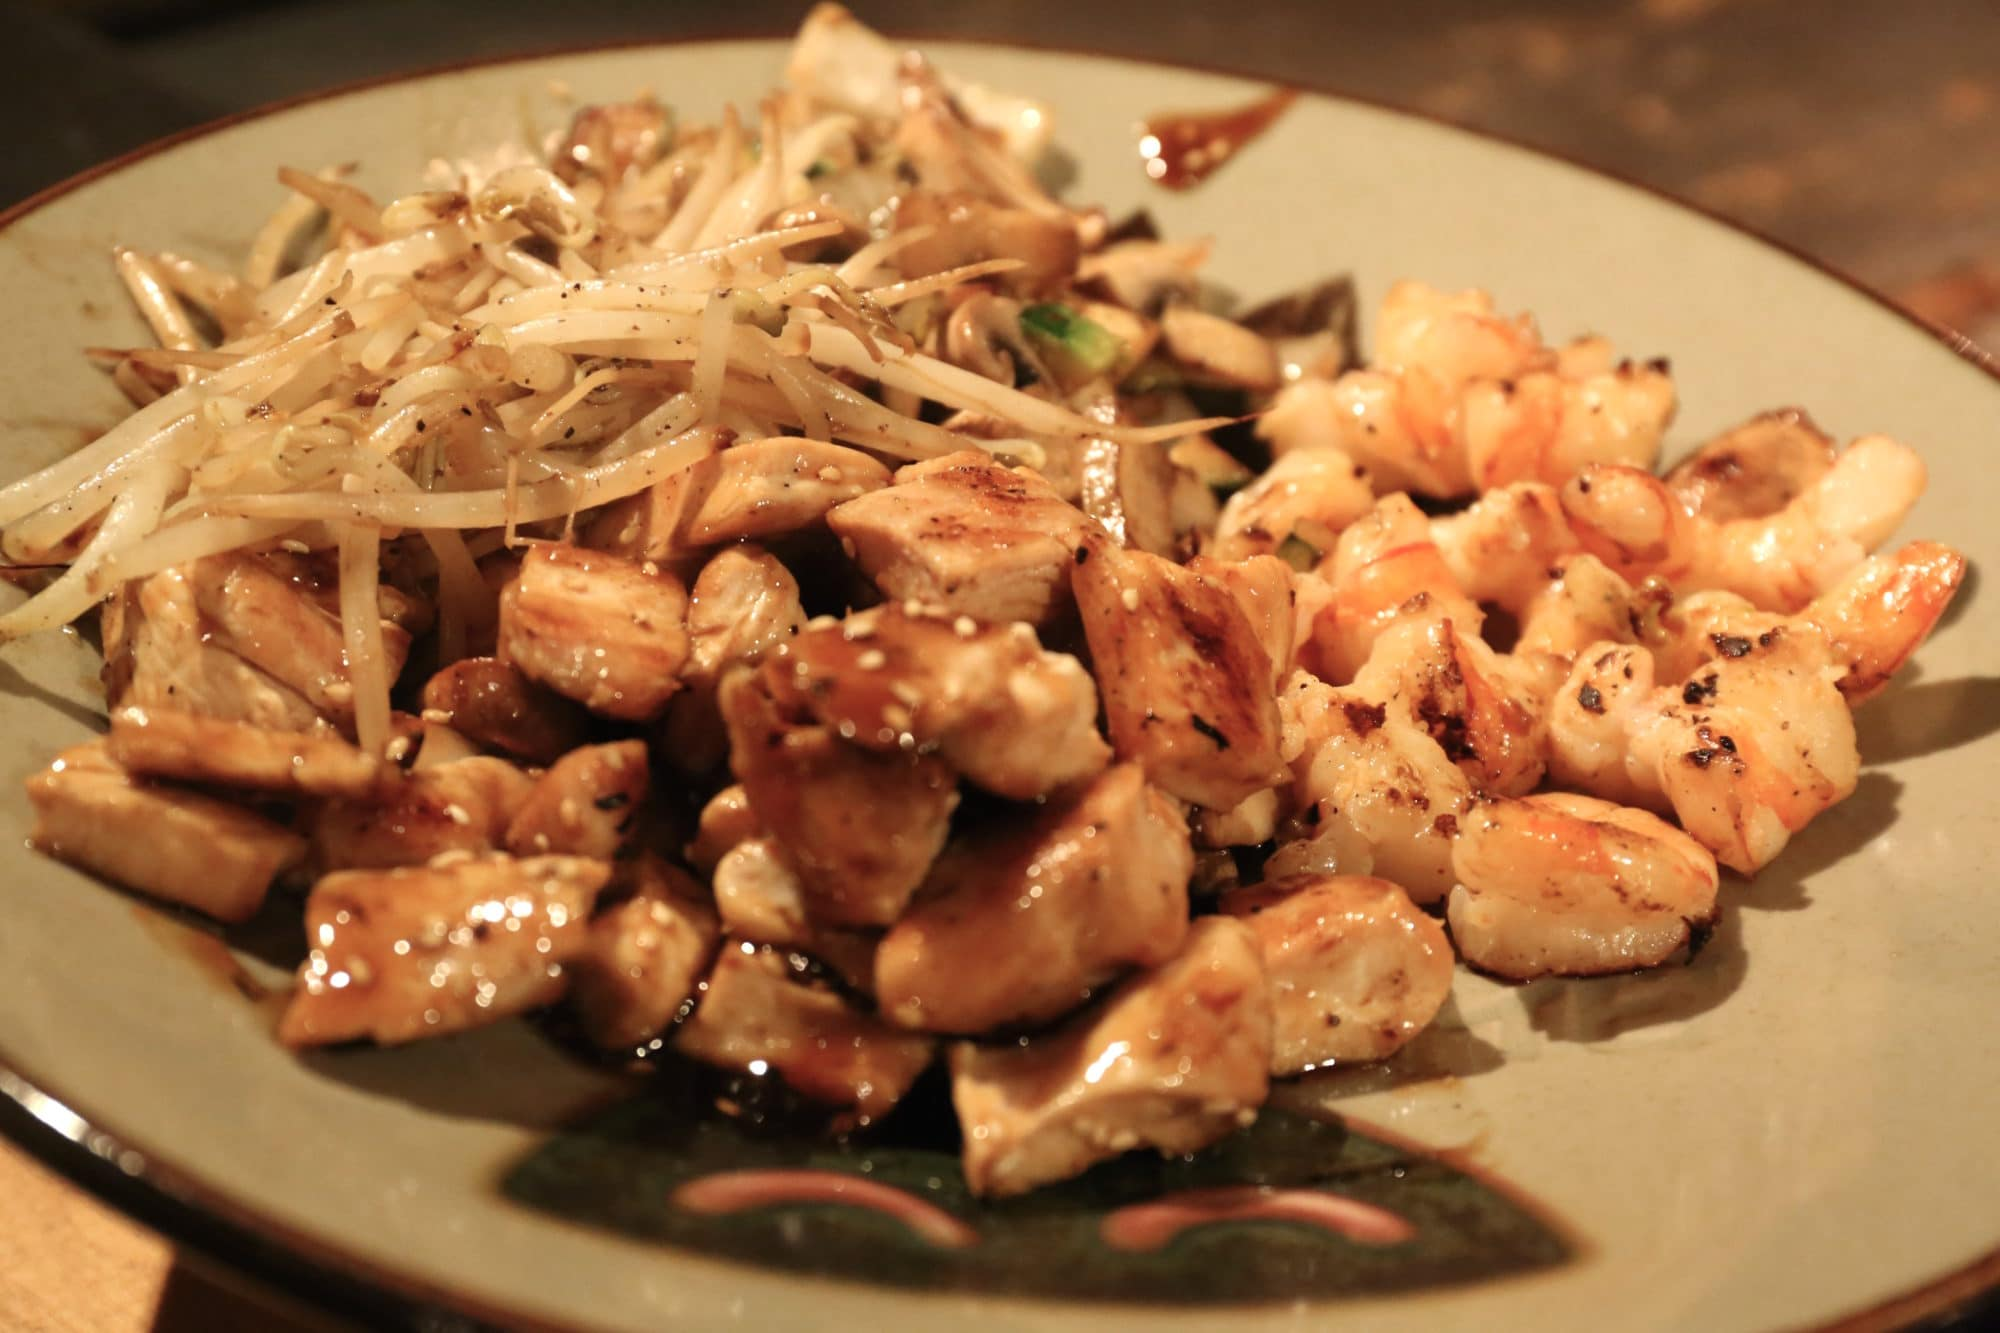 Teriyaki Chicken & Shrimp served with bean sprouts at Benihana